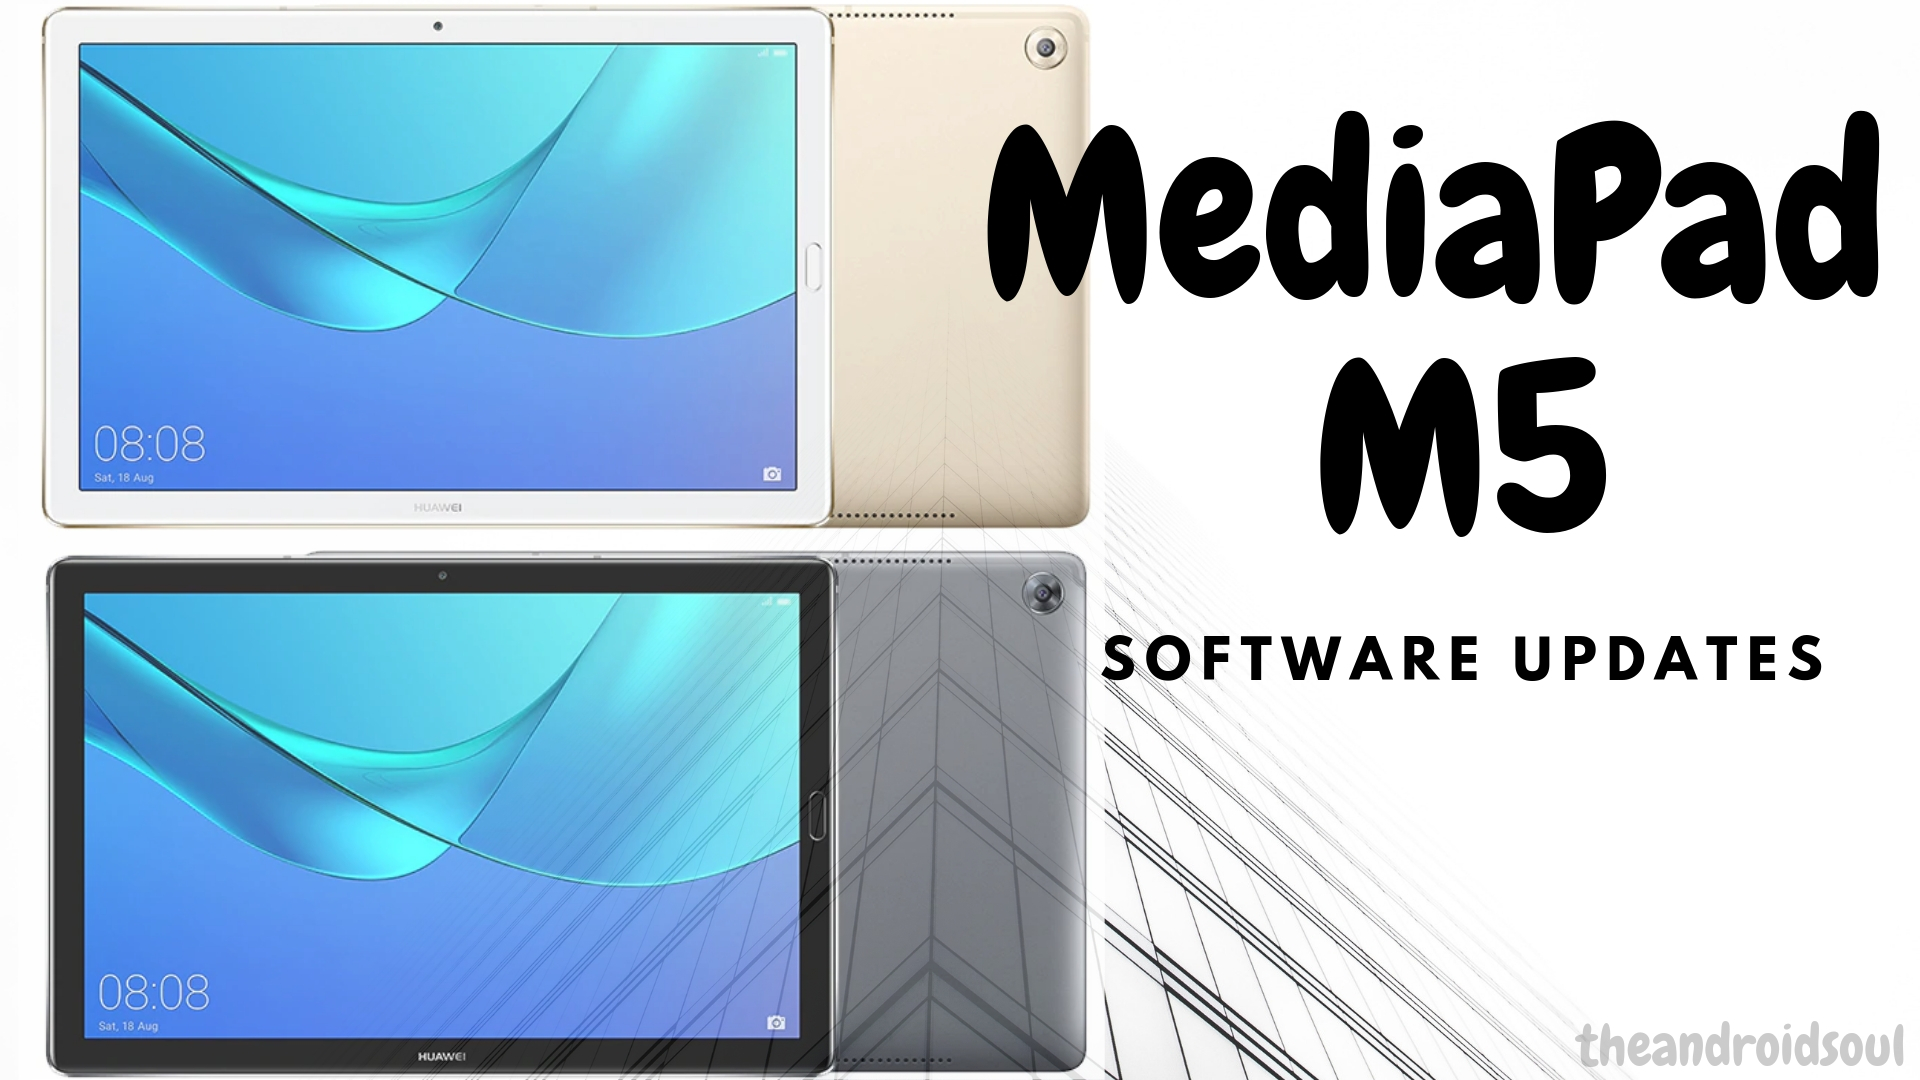 MediaPad M5 software updates